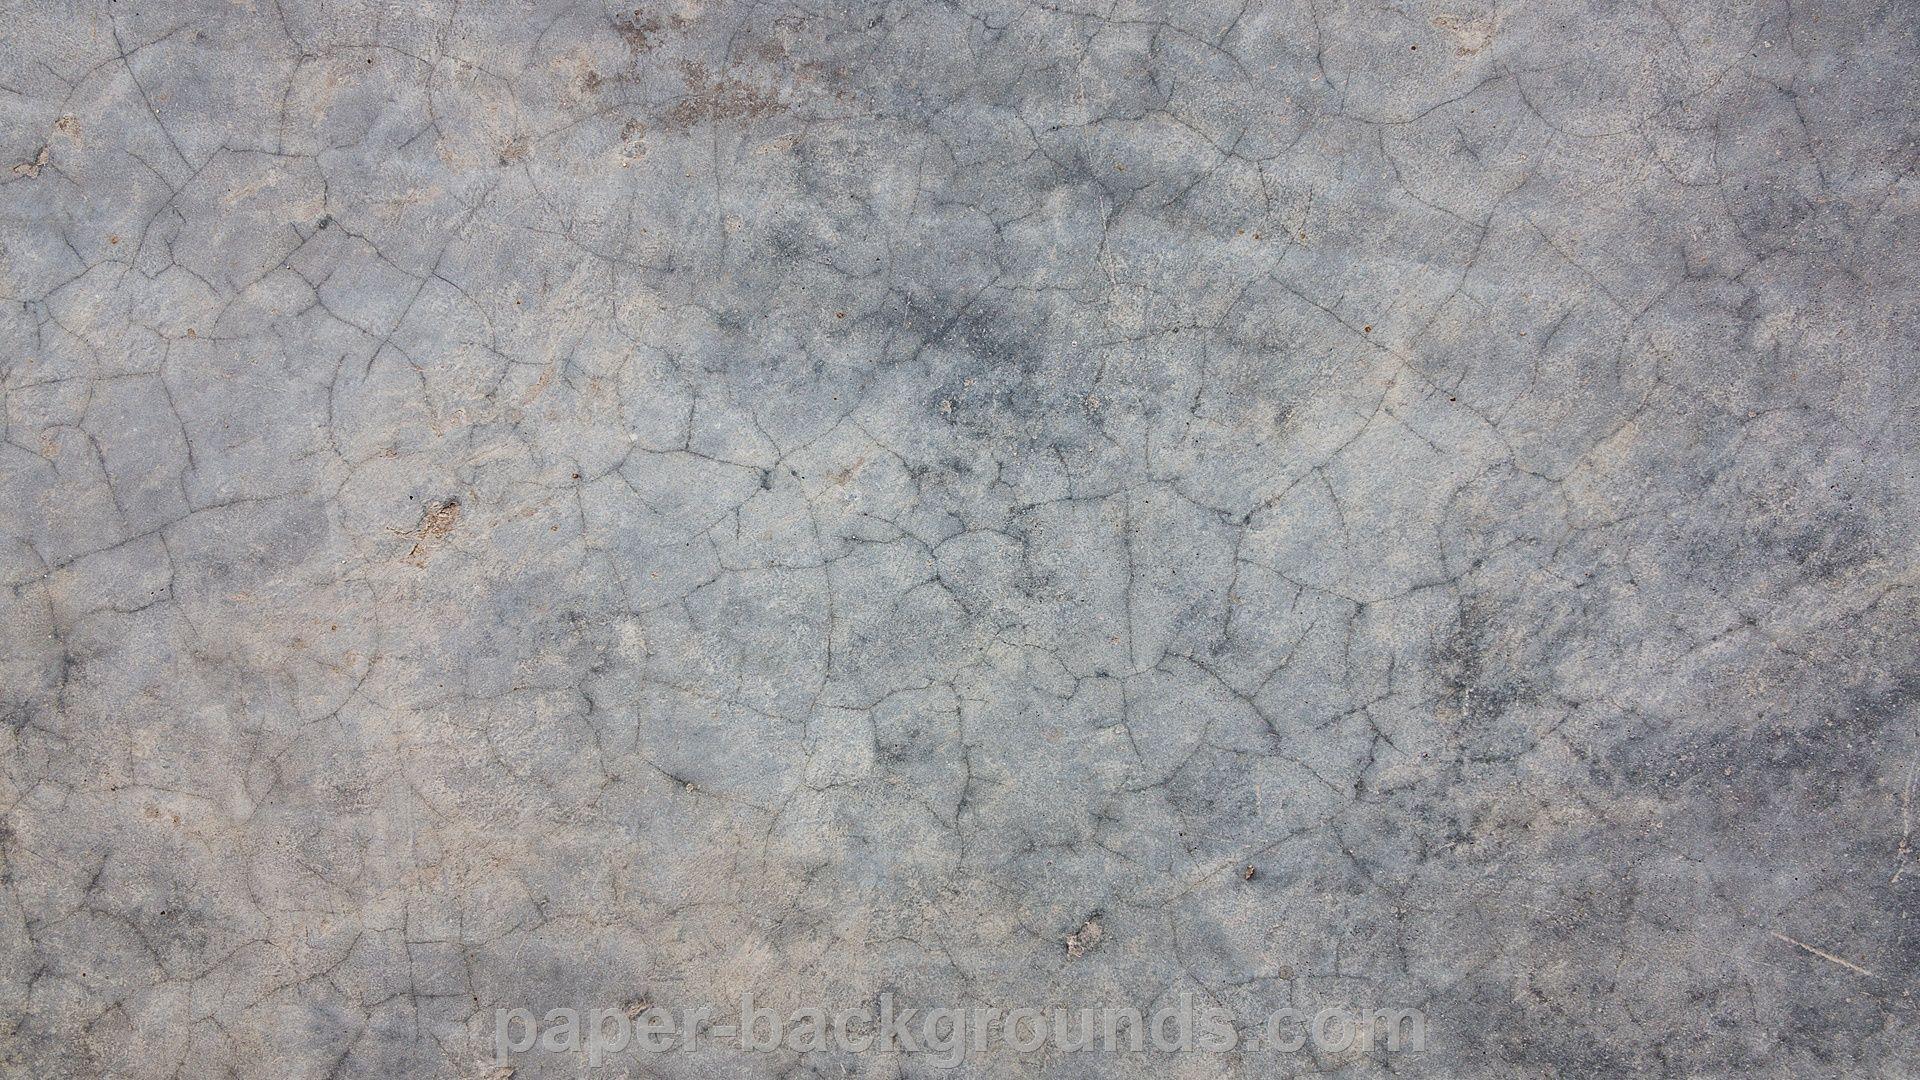 Cracked Concrete Floor Texture Hd Paper Backgrounds